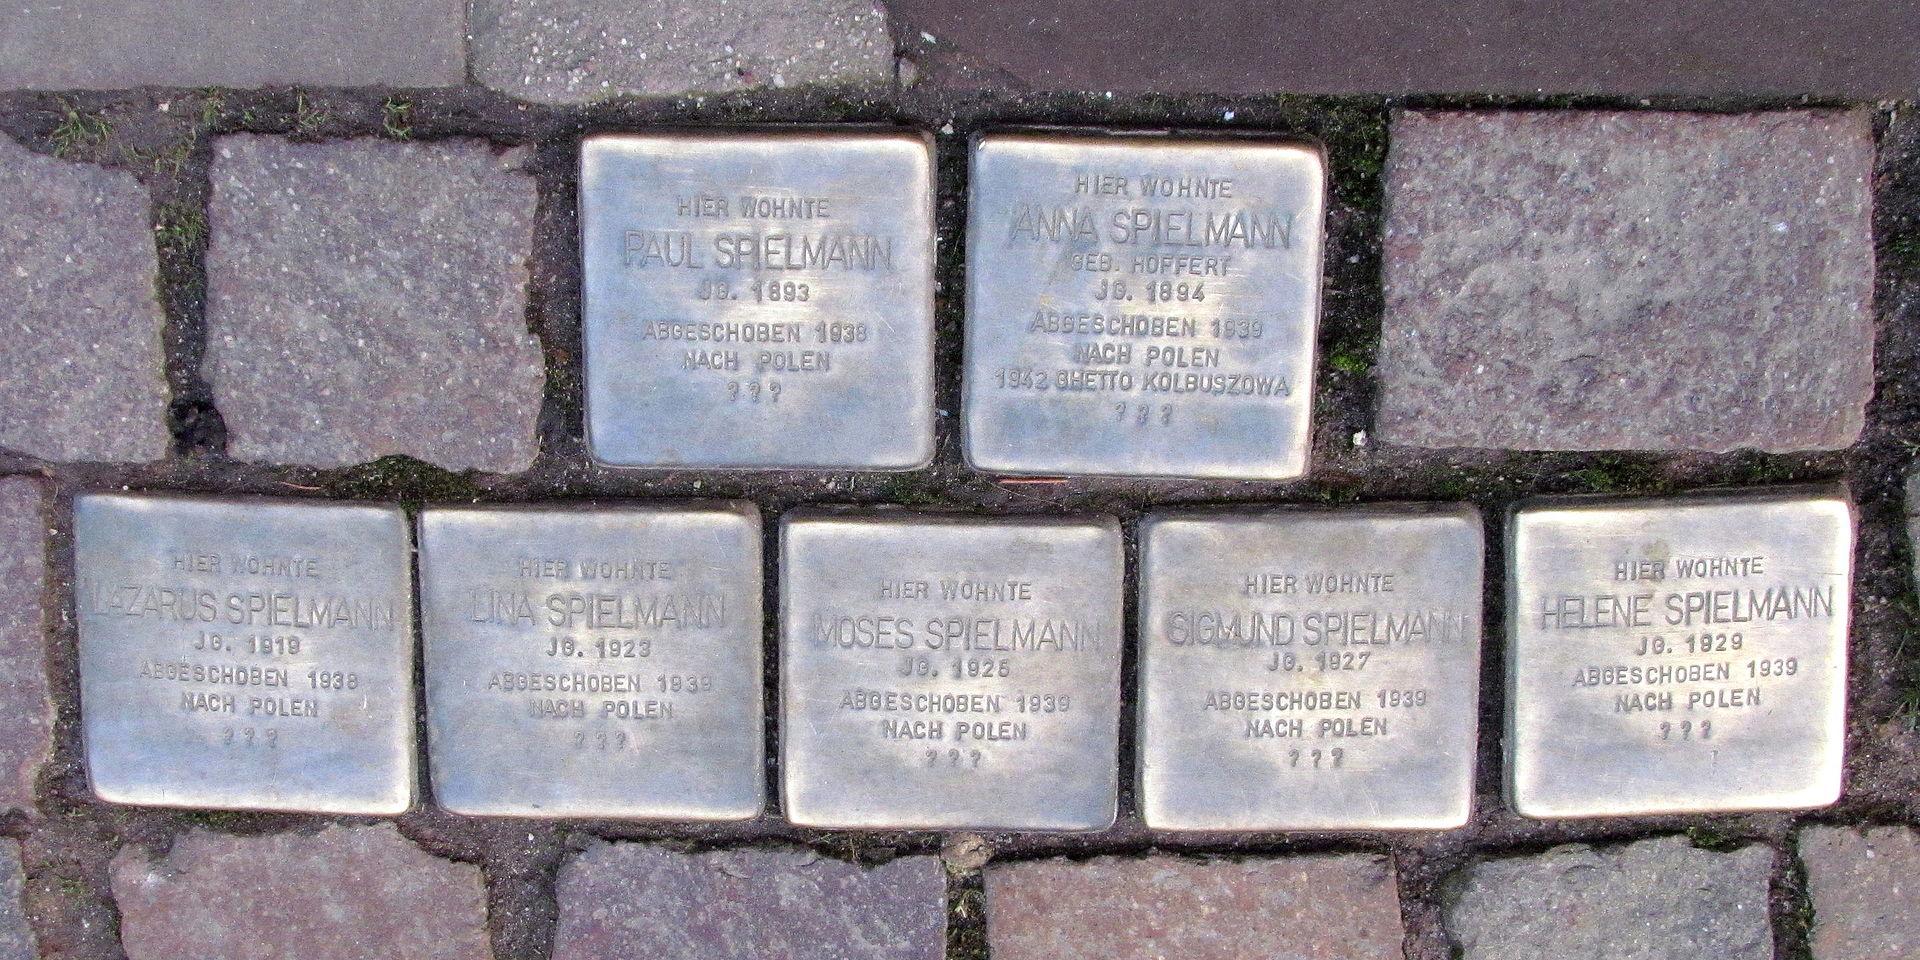 Stolpersteine in Ettlingen Spielmann Marktstr 6 (fcm).jpg